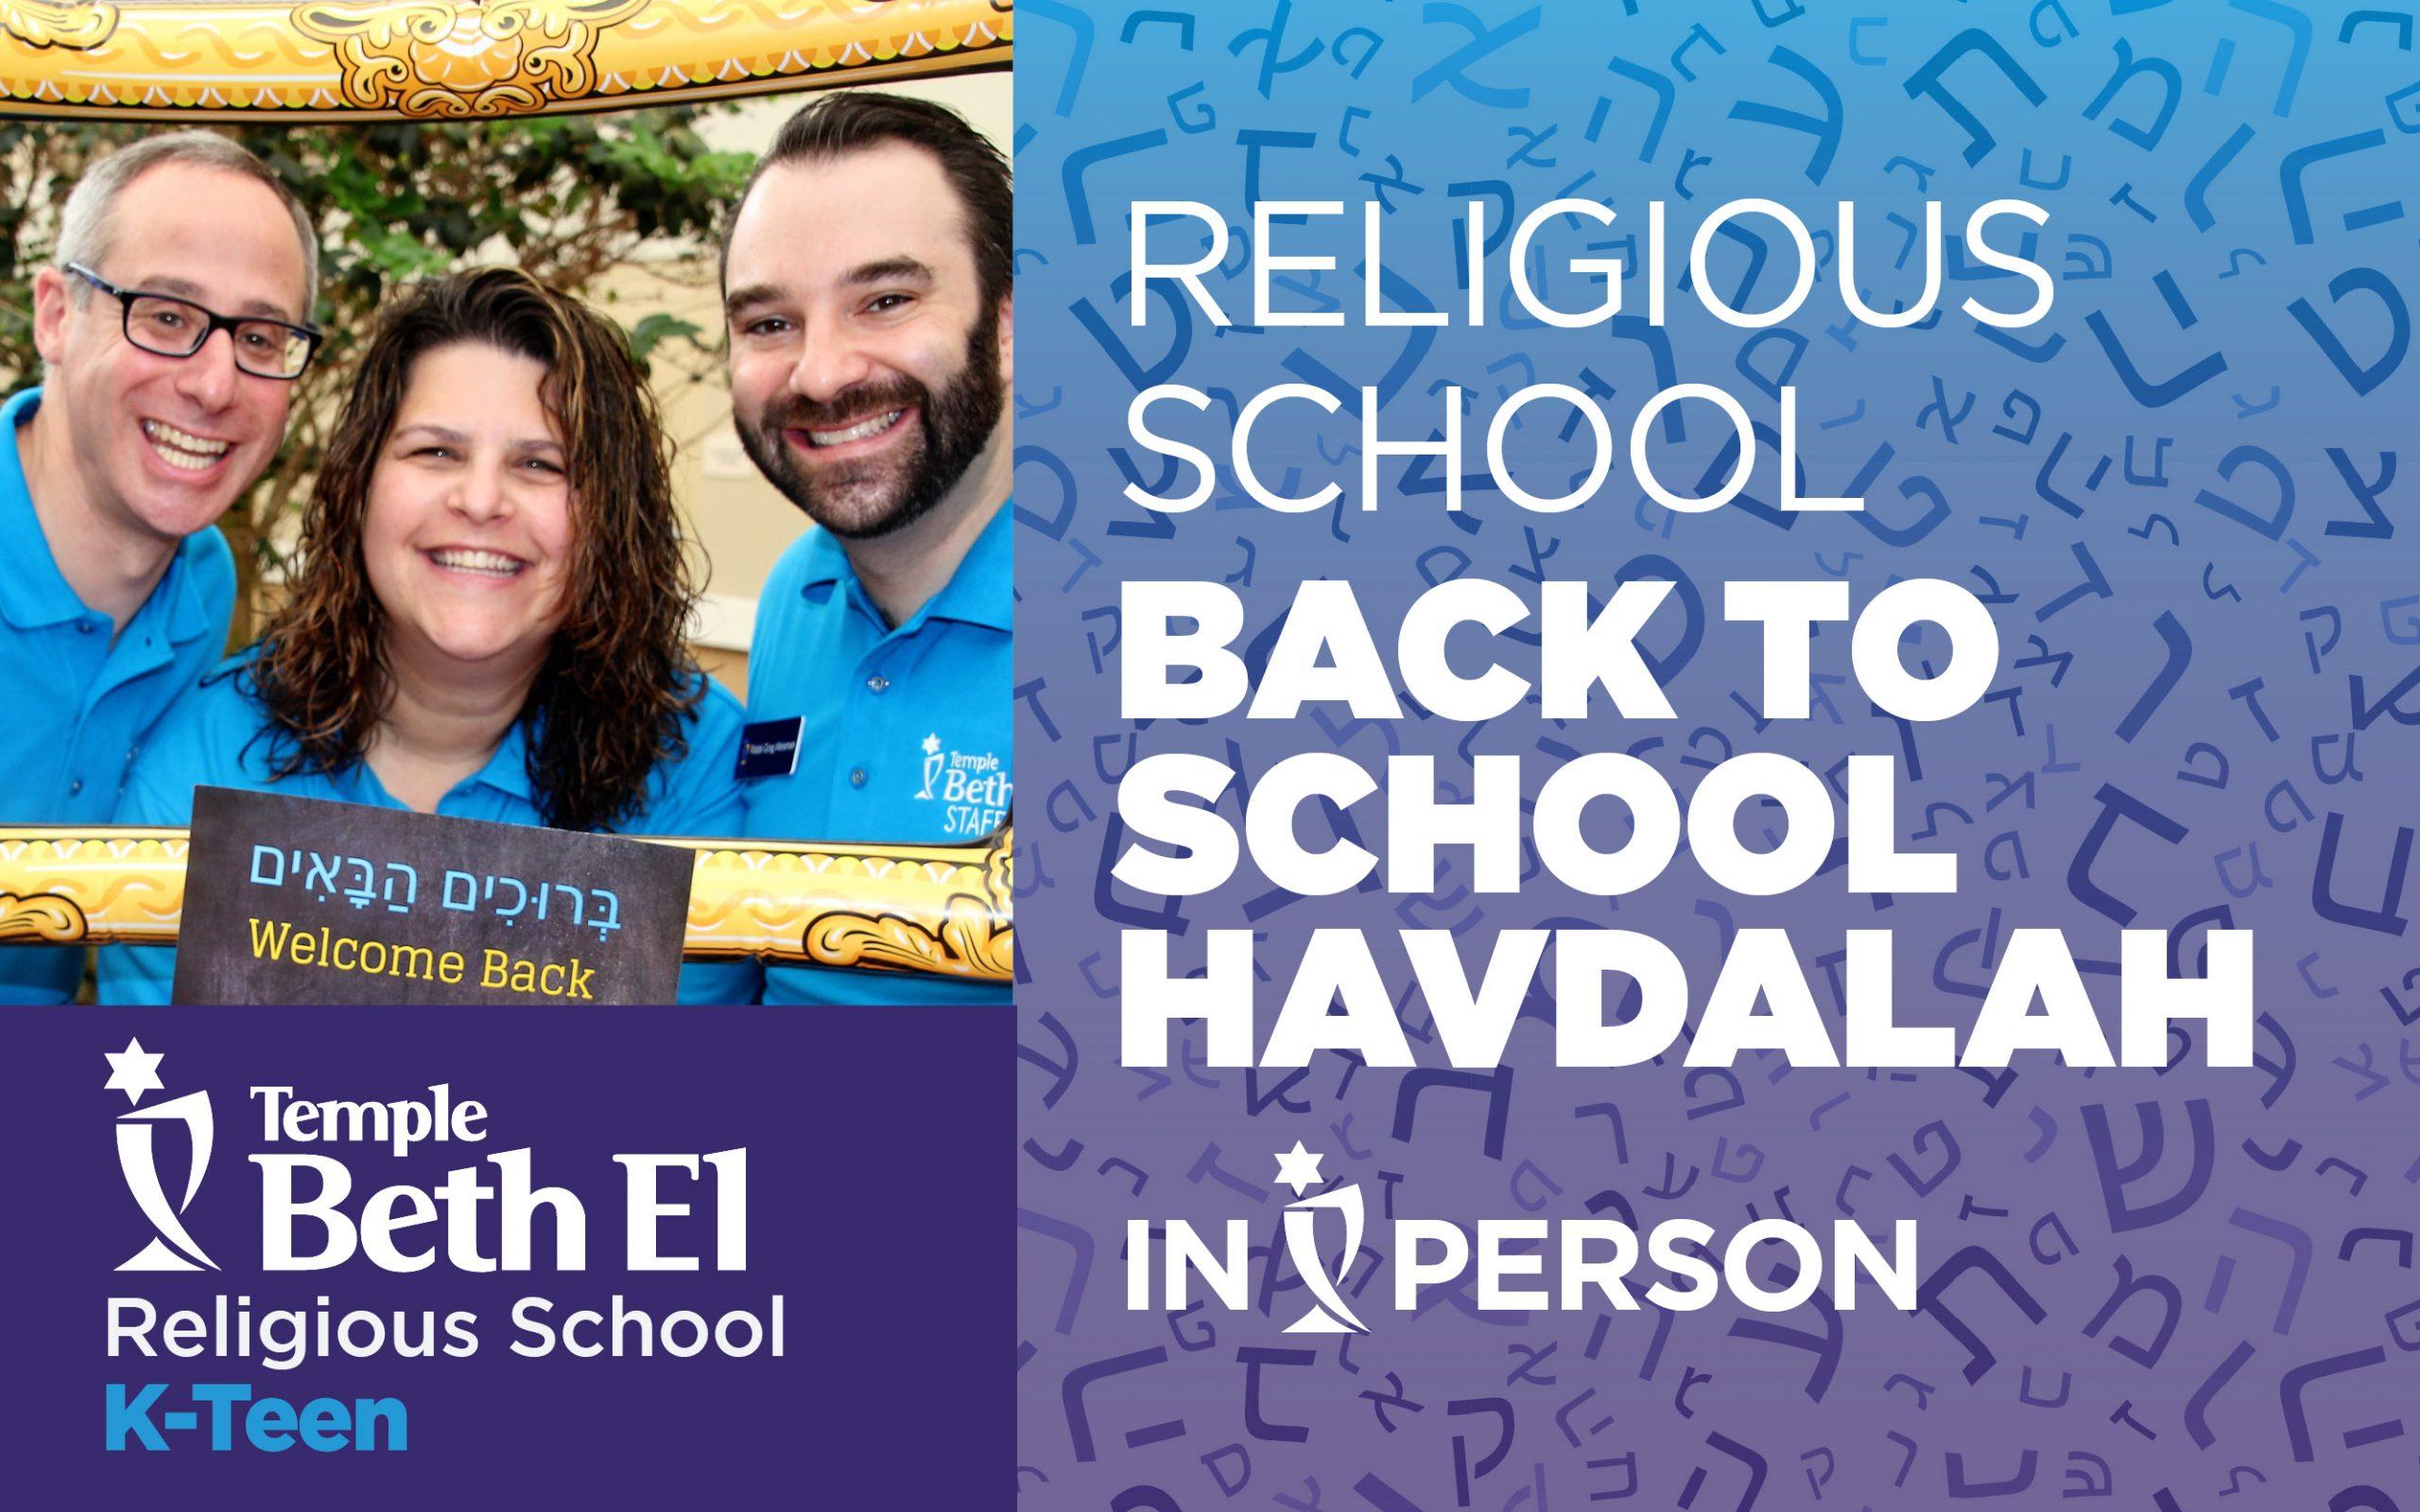 Religious School Back to School Havdalah August 2021